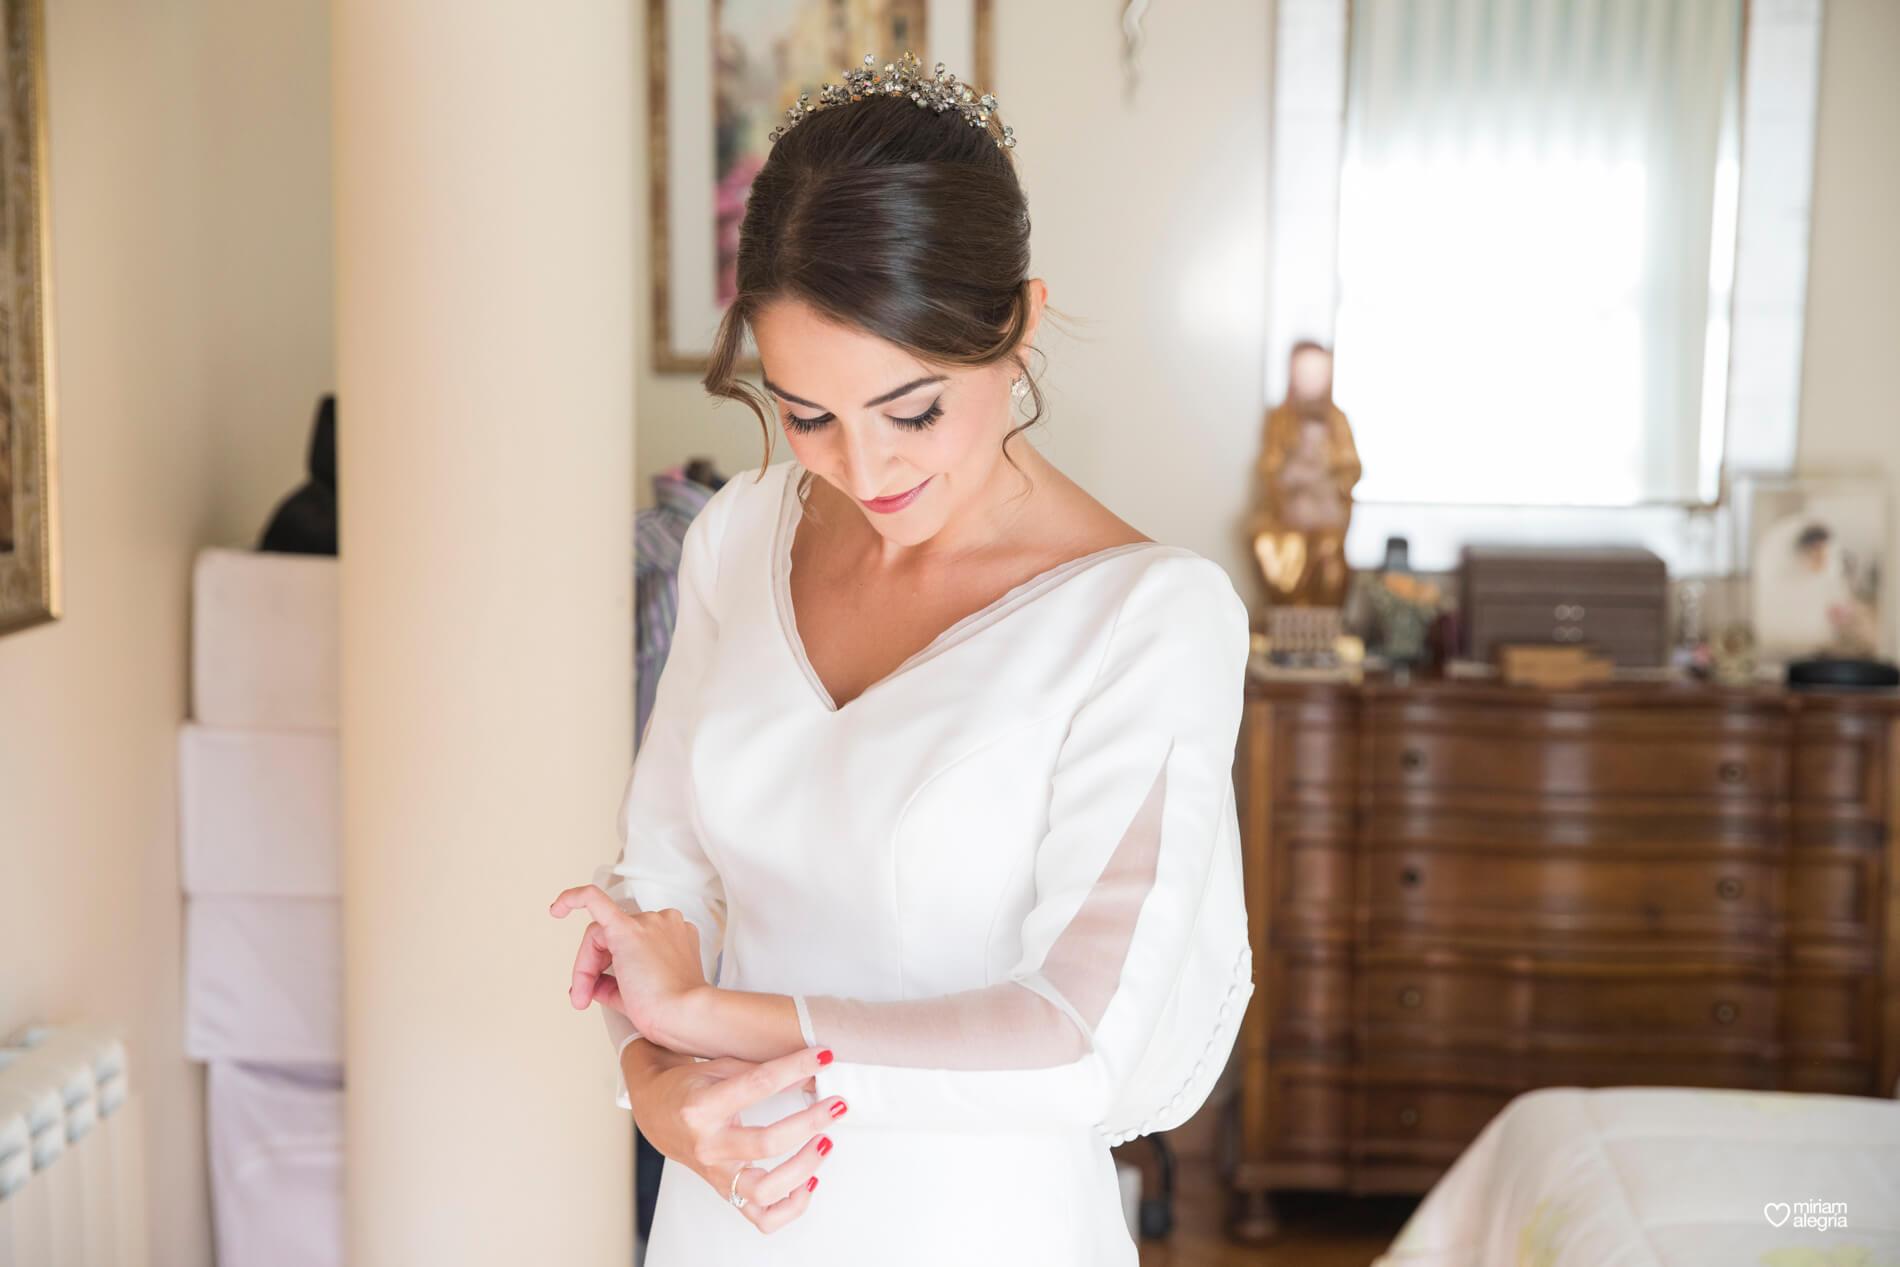 vestido-de-novia-paula-del-vas-miriam-alegria-fotografos-boda-murcia-21